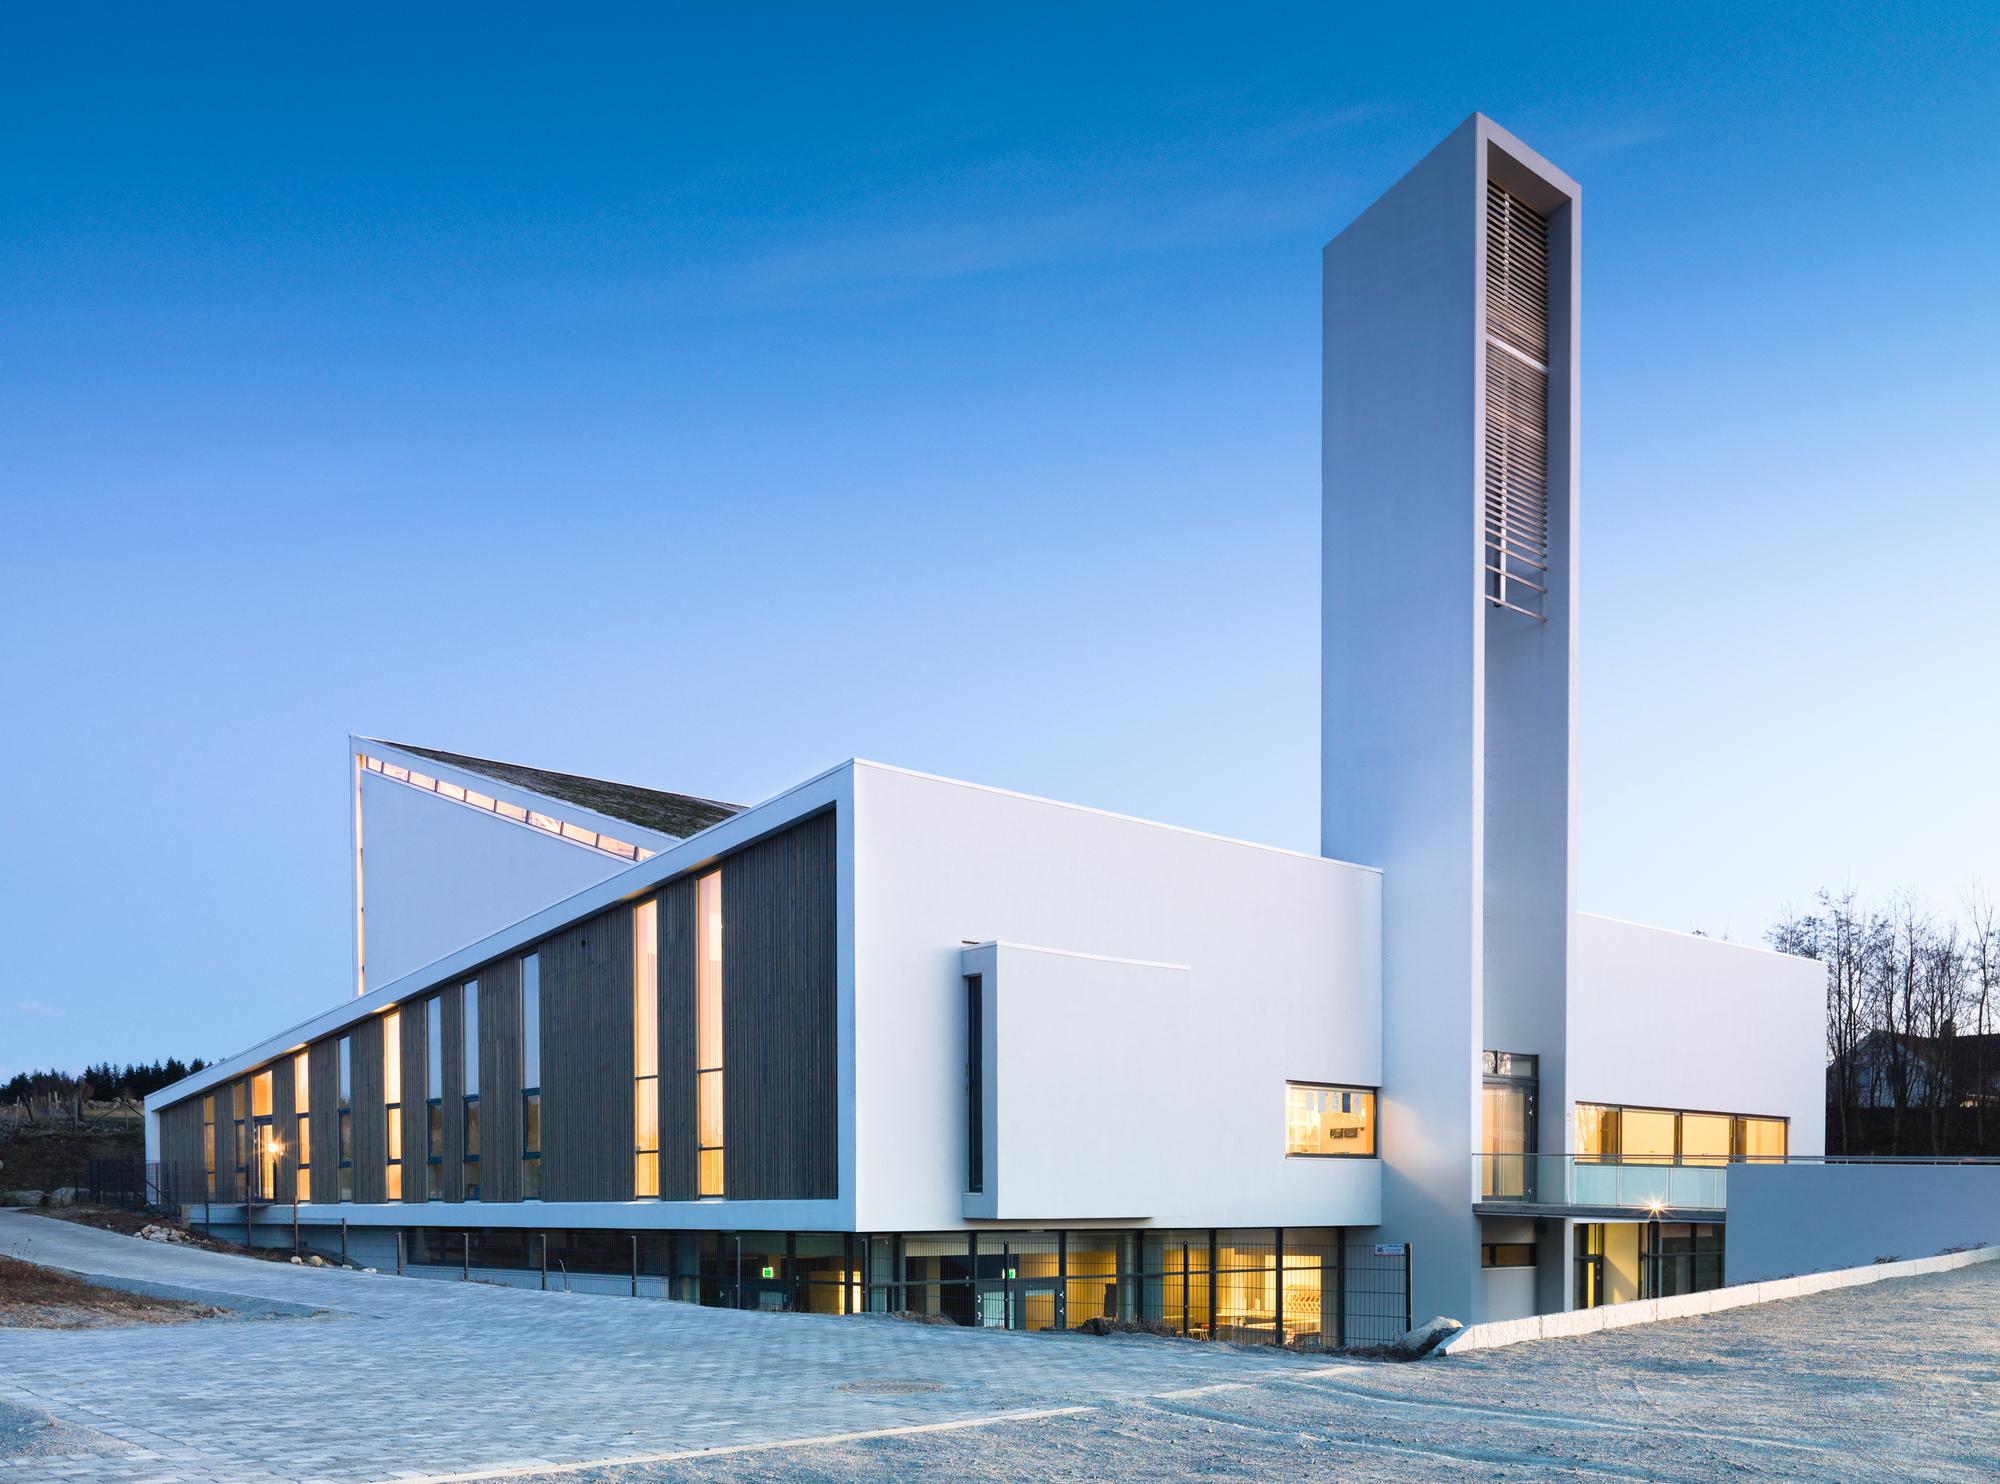 Froeyland Orstad Church / LINK Arkitektur AS © Hundven-Clements Photography